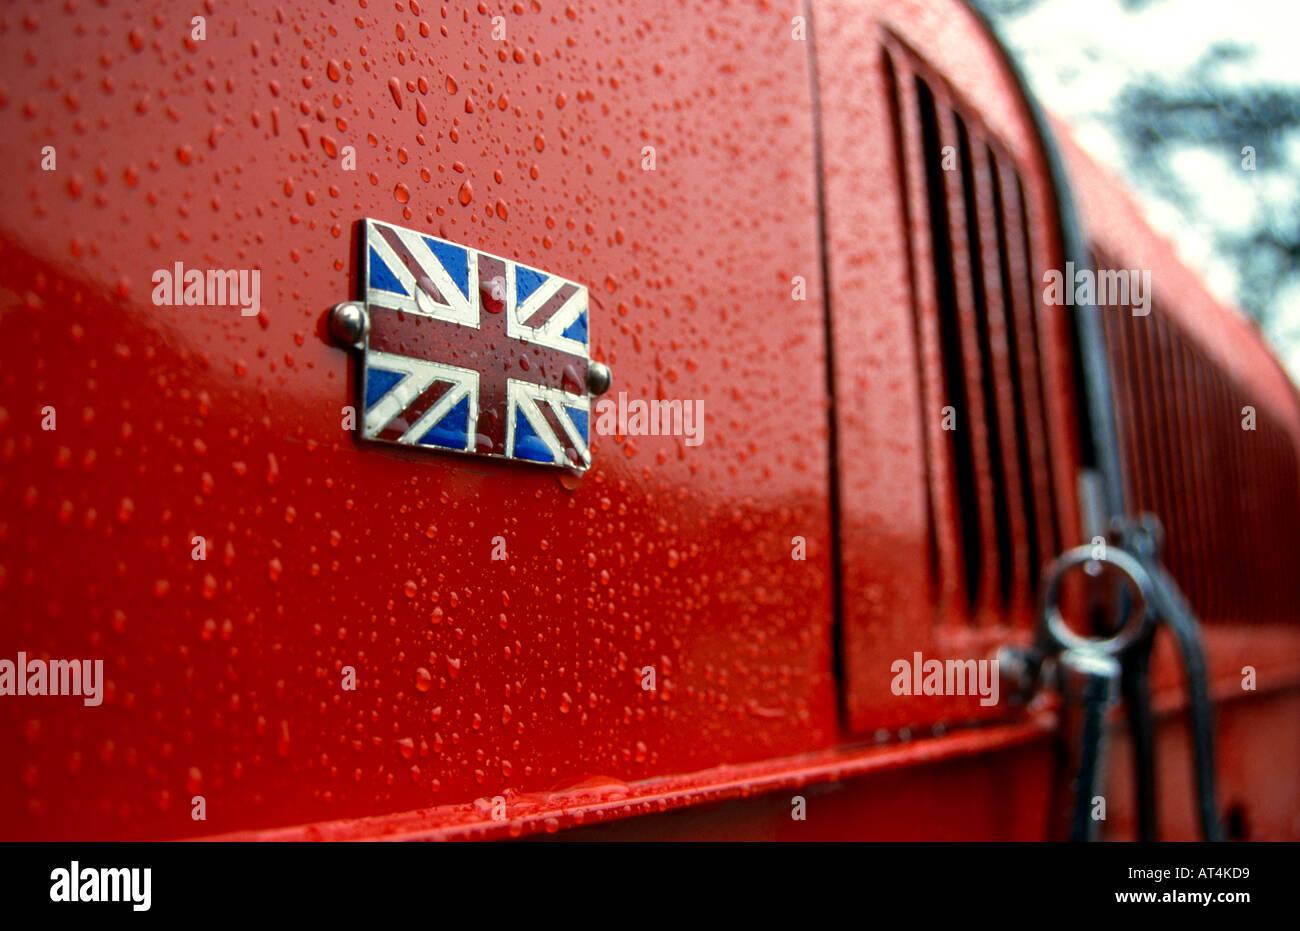 Red Flag Car Historical Stock Photos & Red Flag Car